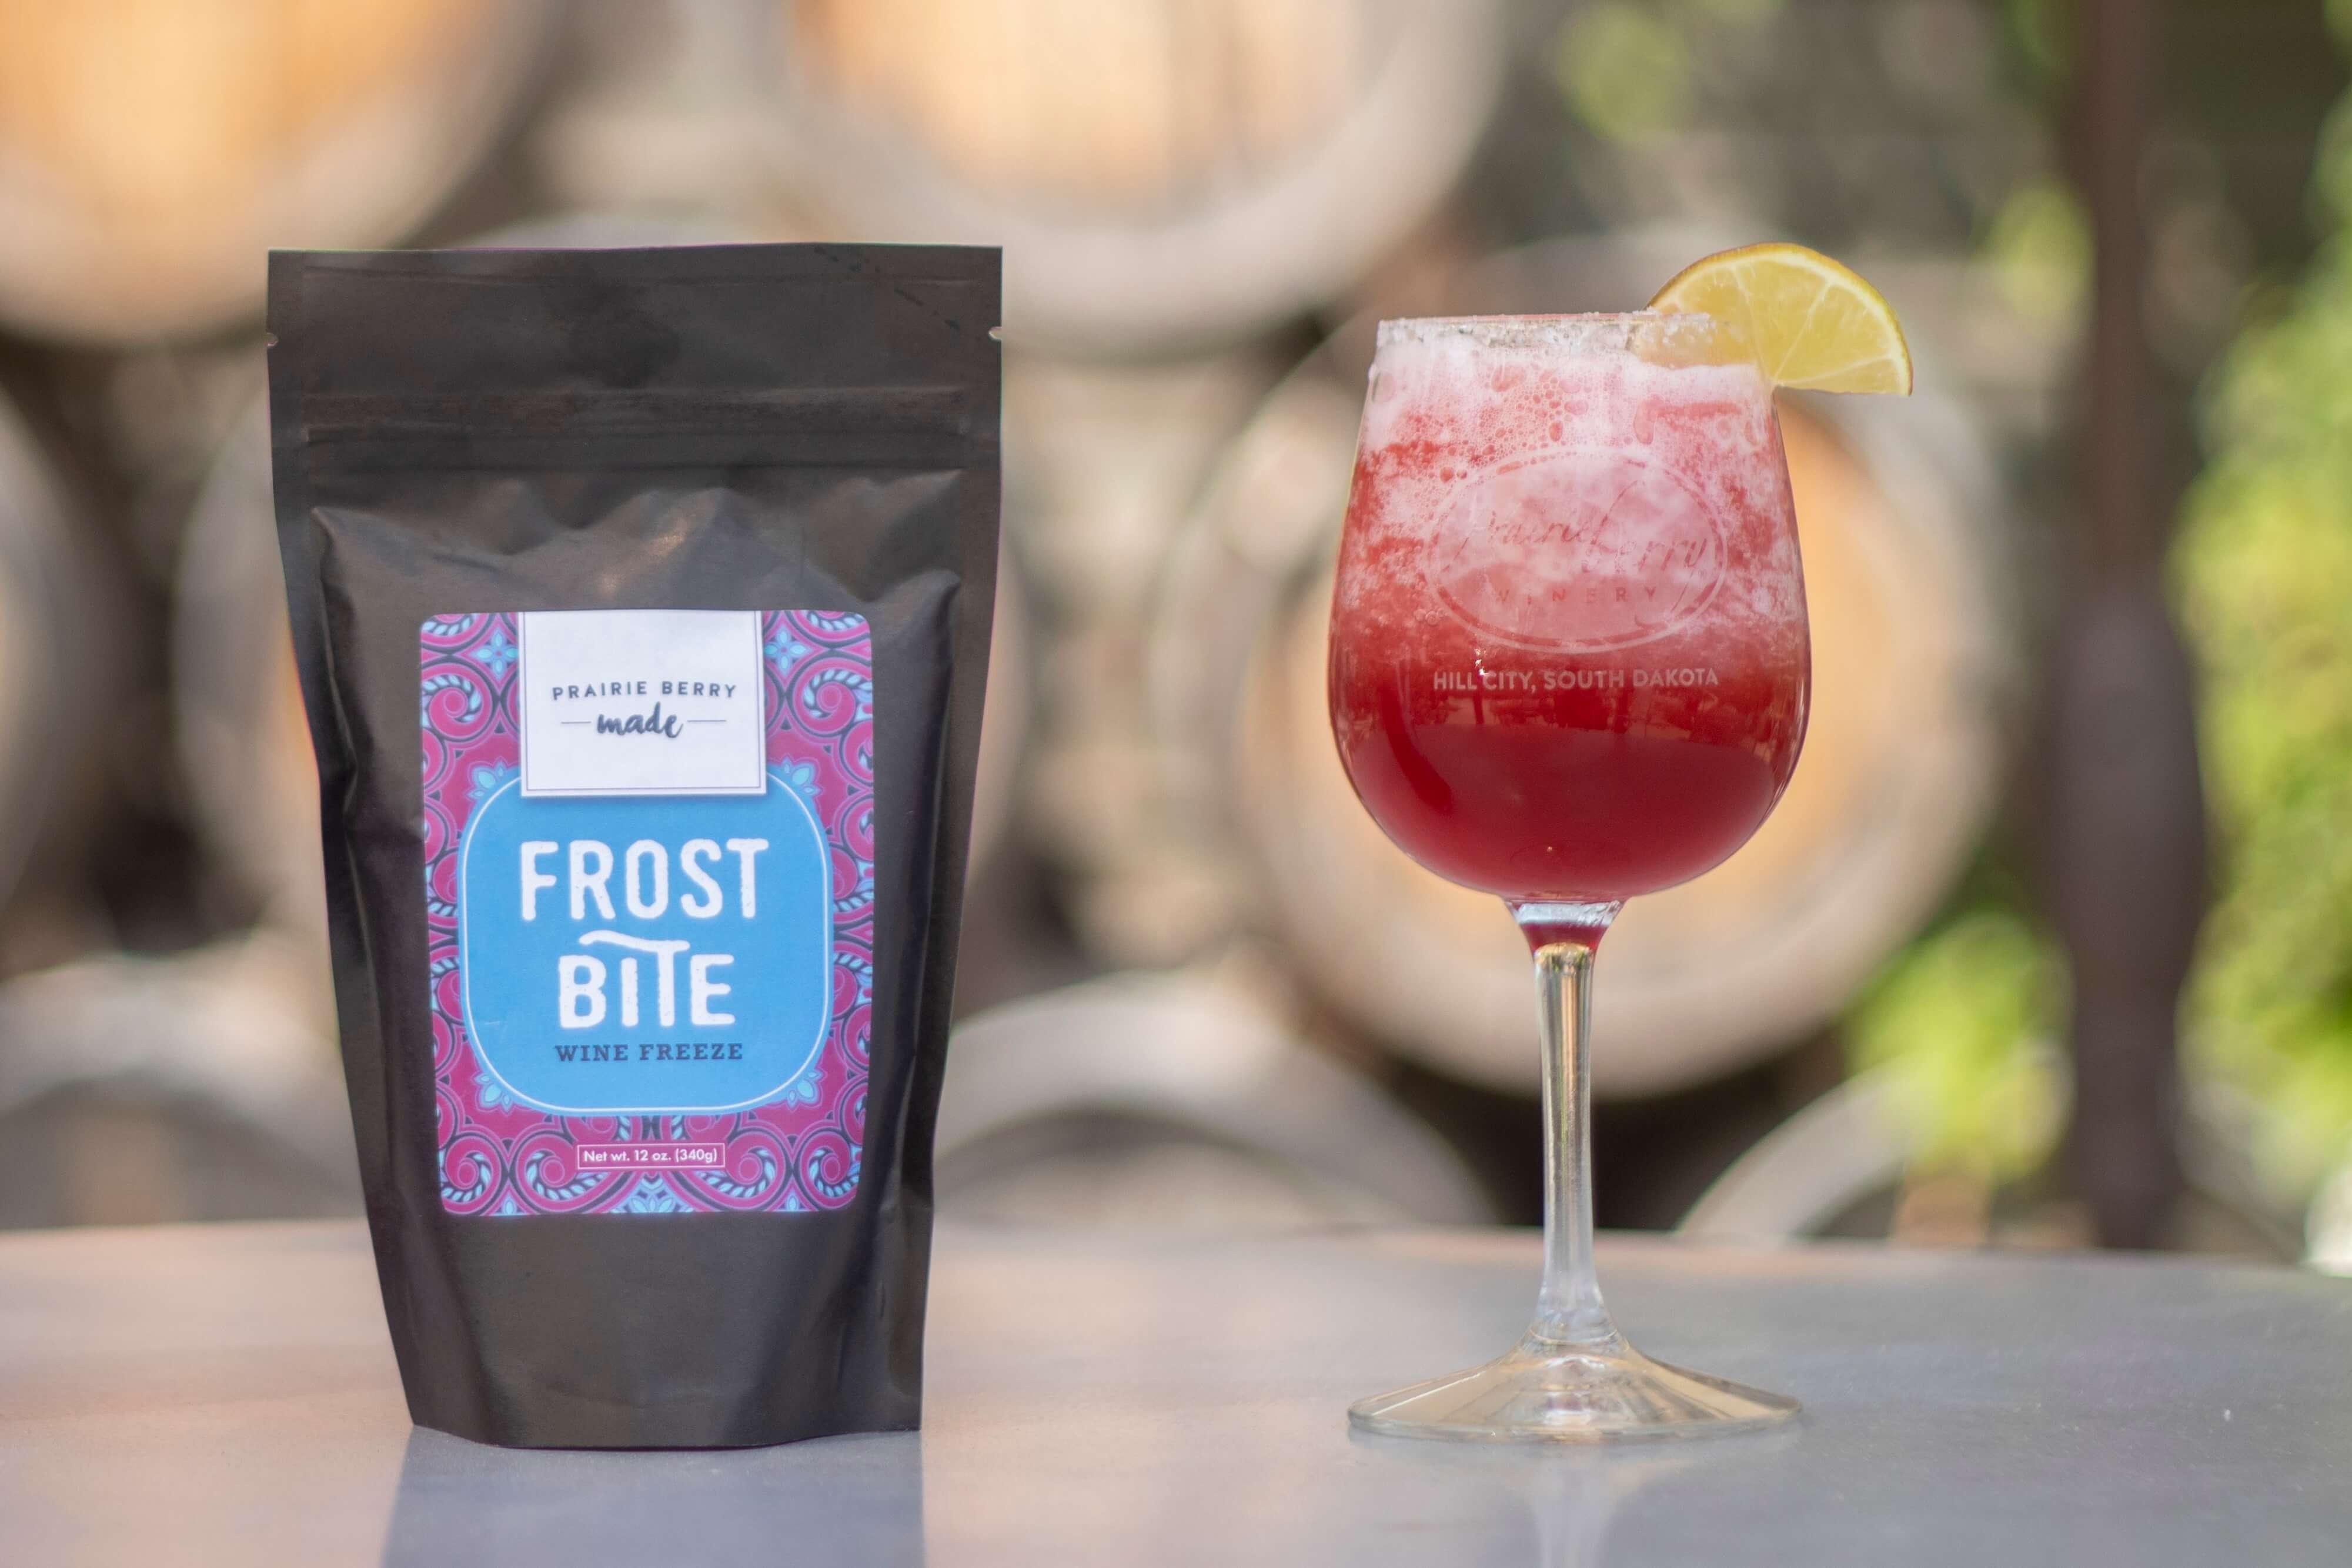 Frost Bite Wine Freeze by Prairie Berry Winery turns your favorite wine into a frozen, slushy, snow cone-like treat